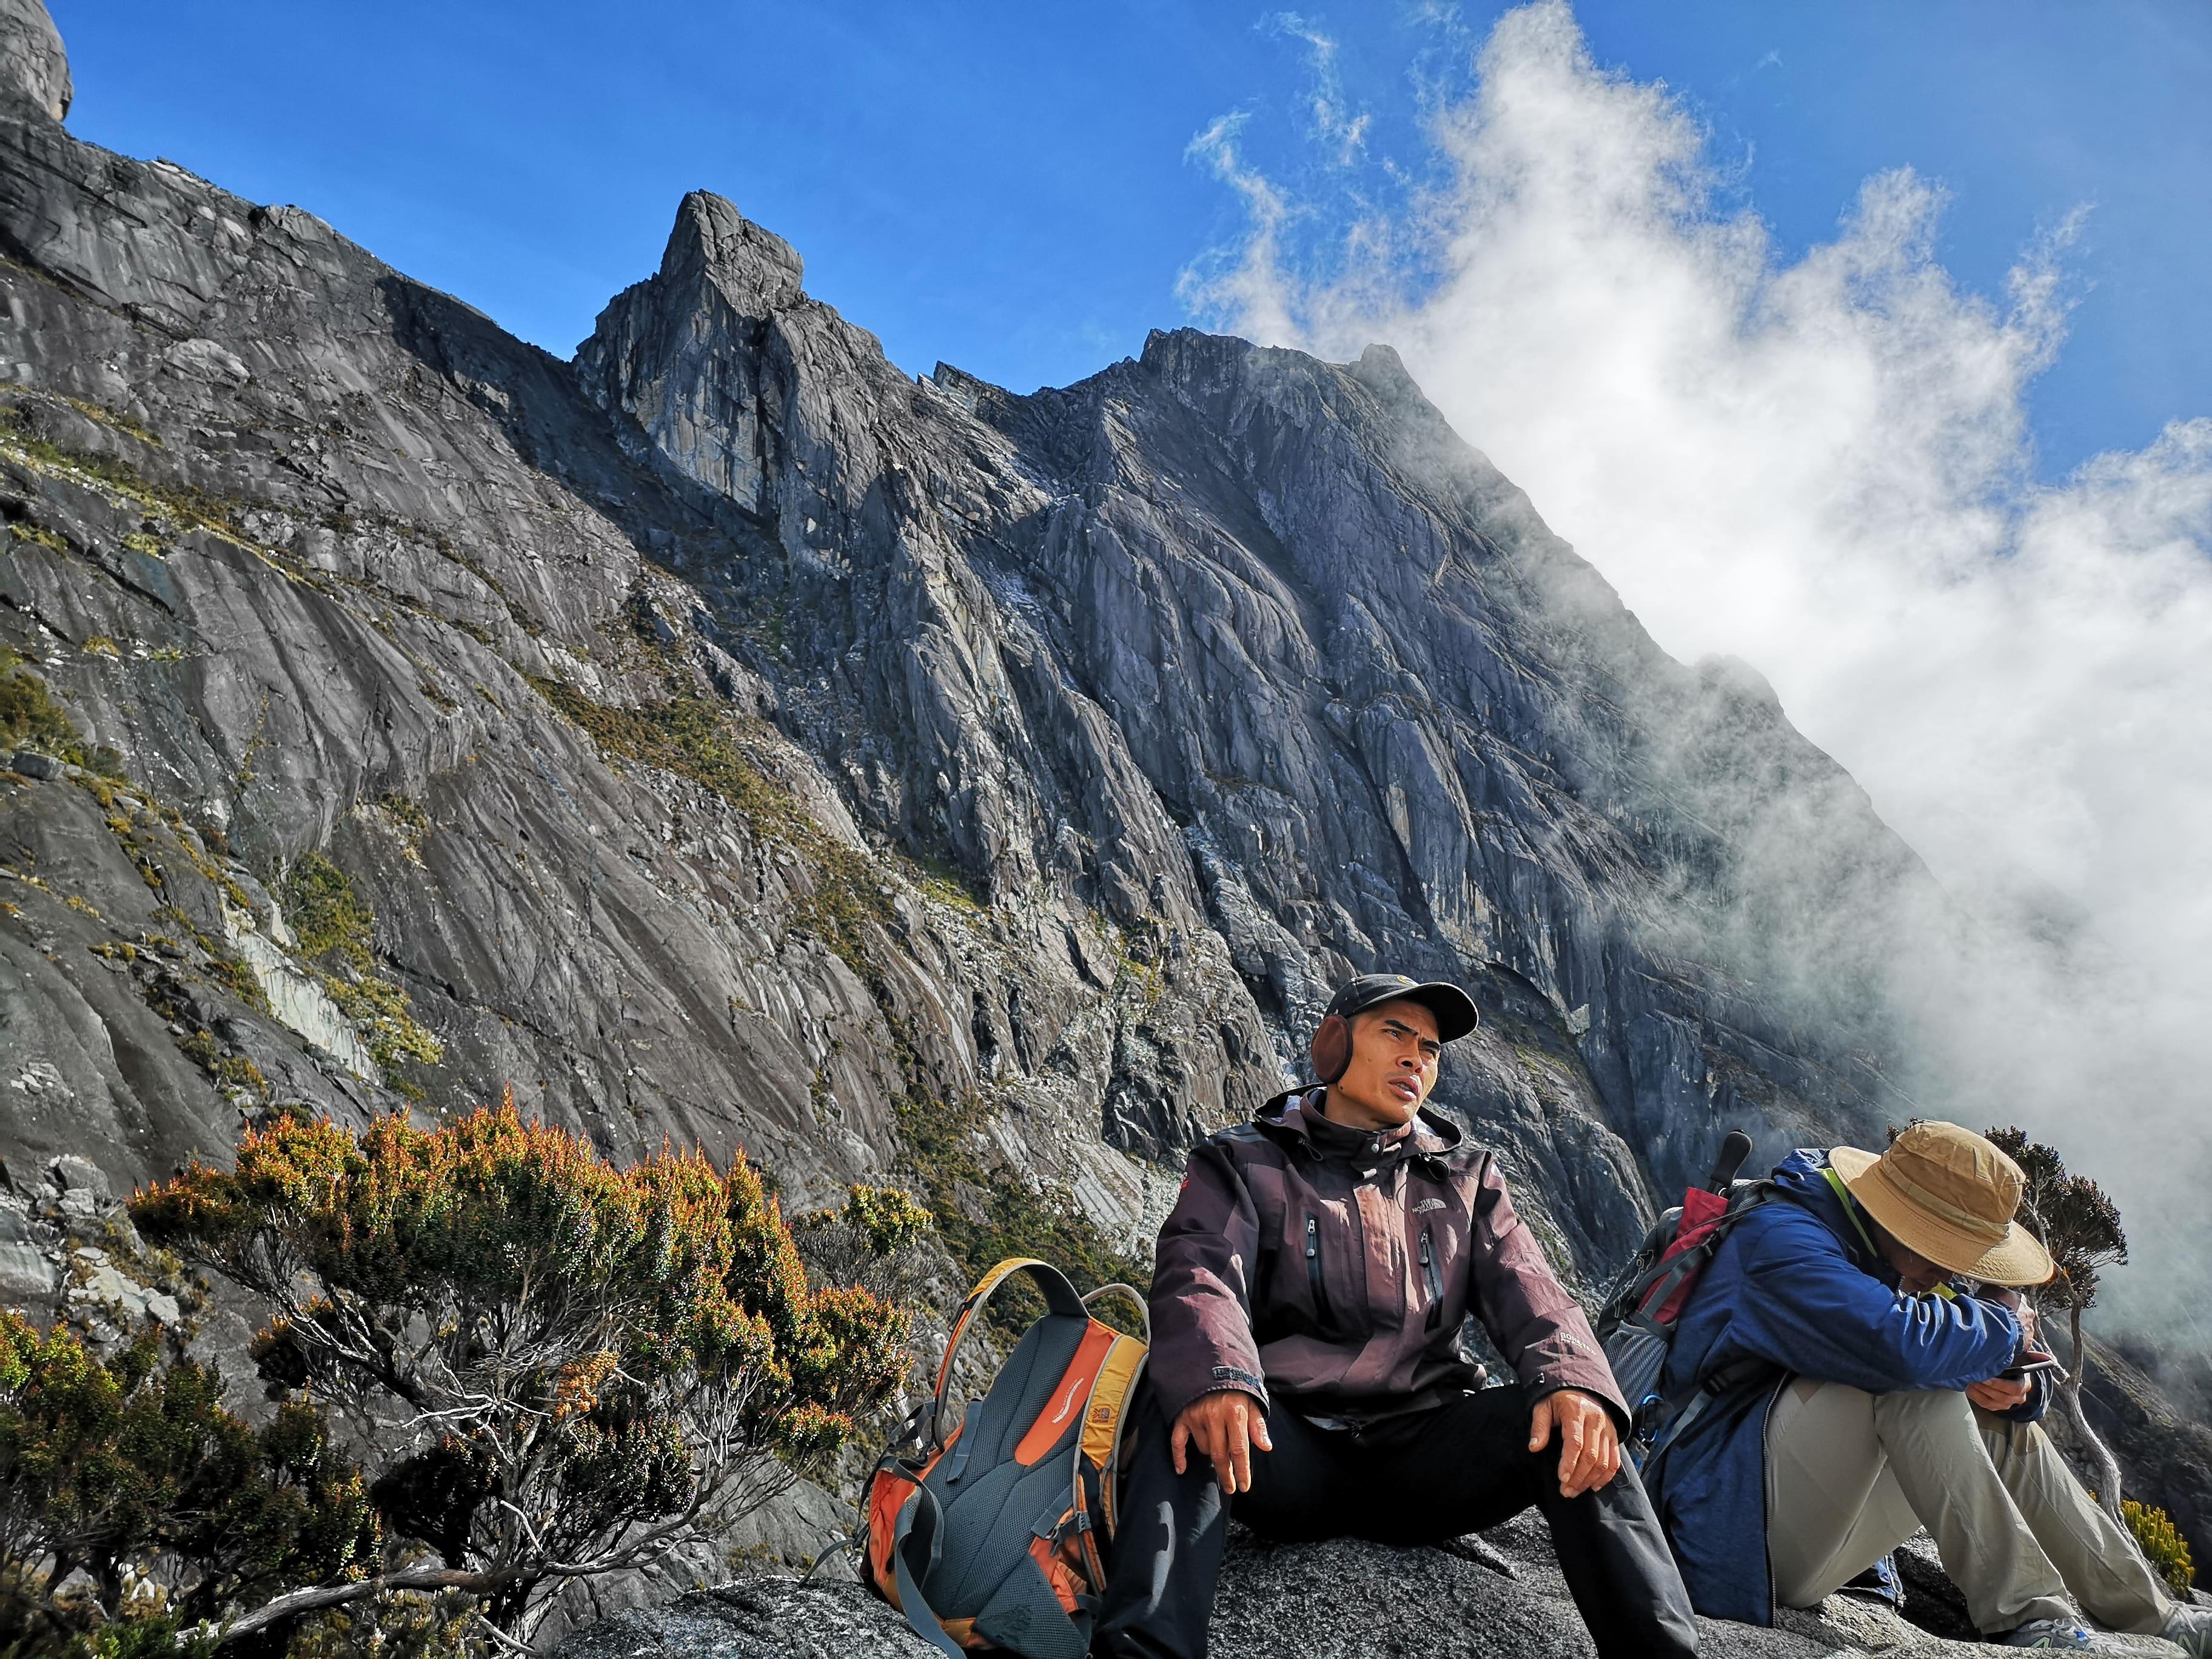 Hendra, salah seorang guide di Kinabalu yang mengawal kumpulan kami